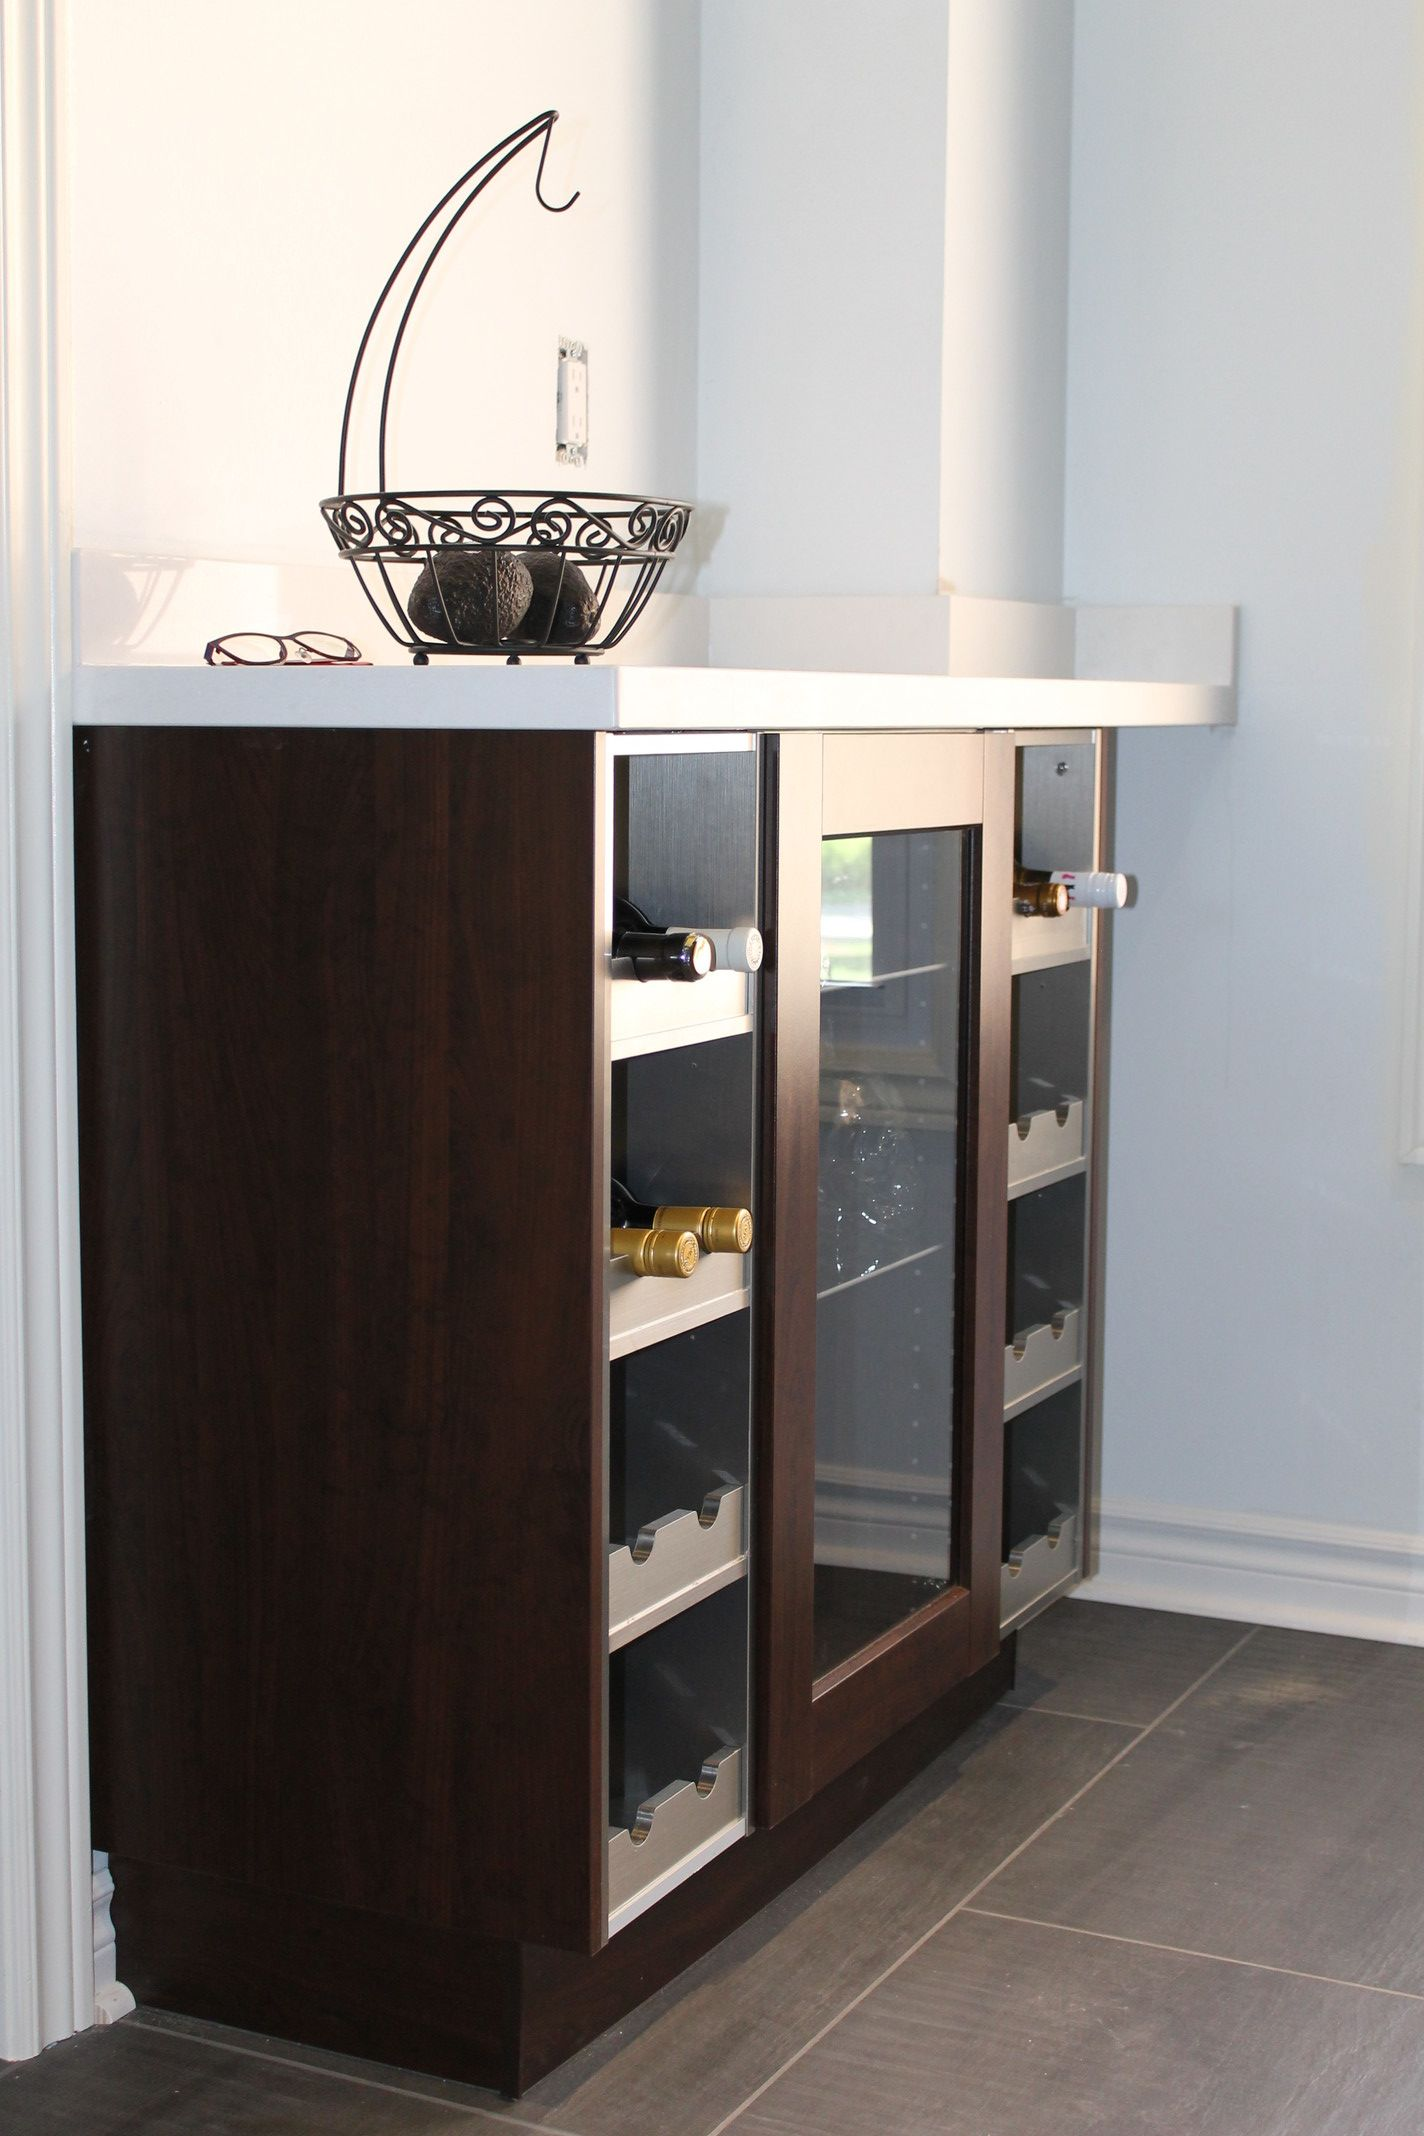 IKEA Wine Cabinet. Wine Rack. Stainless Steel. IKEA